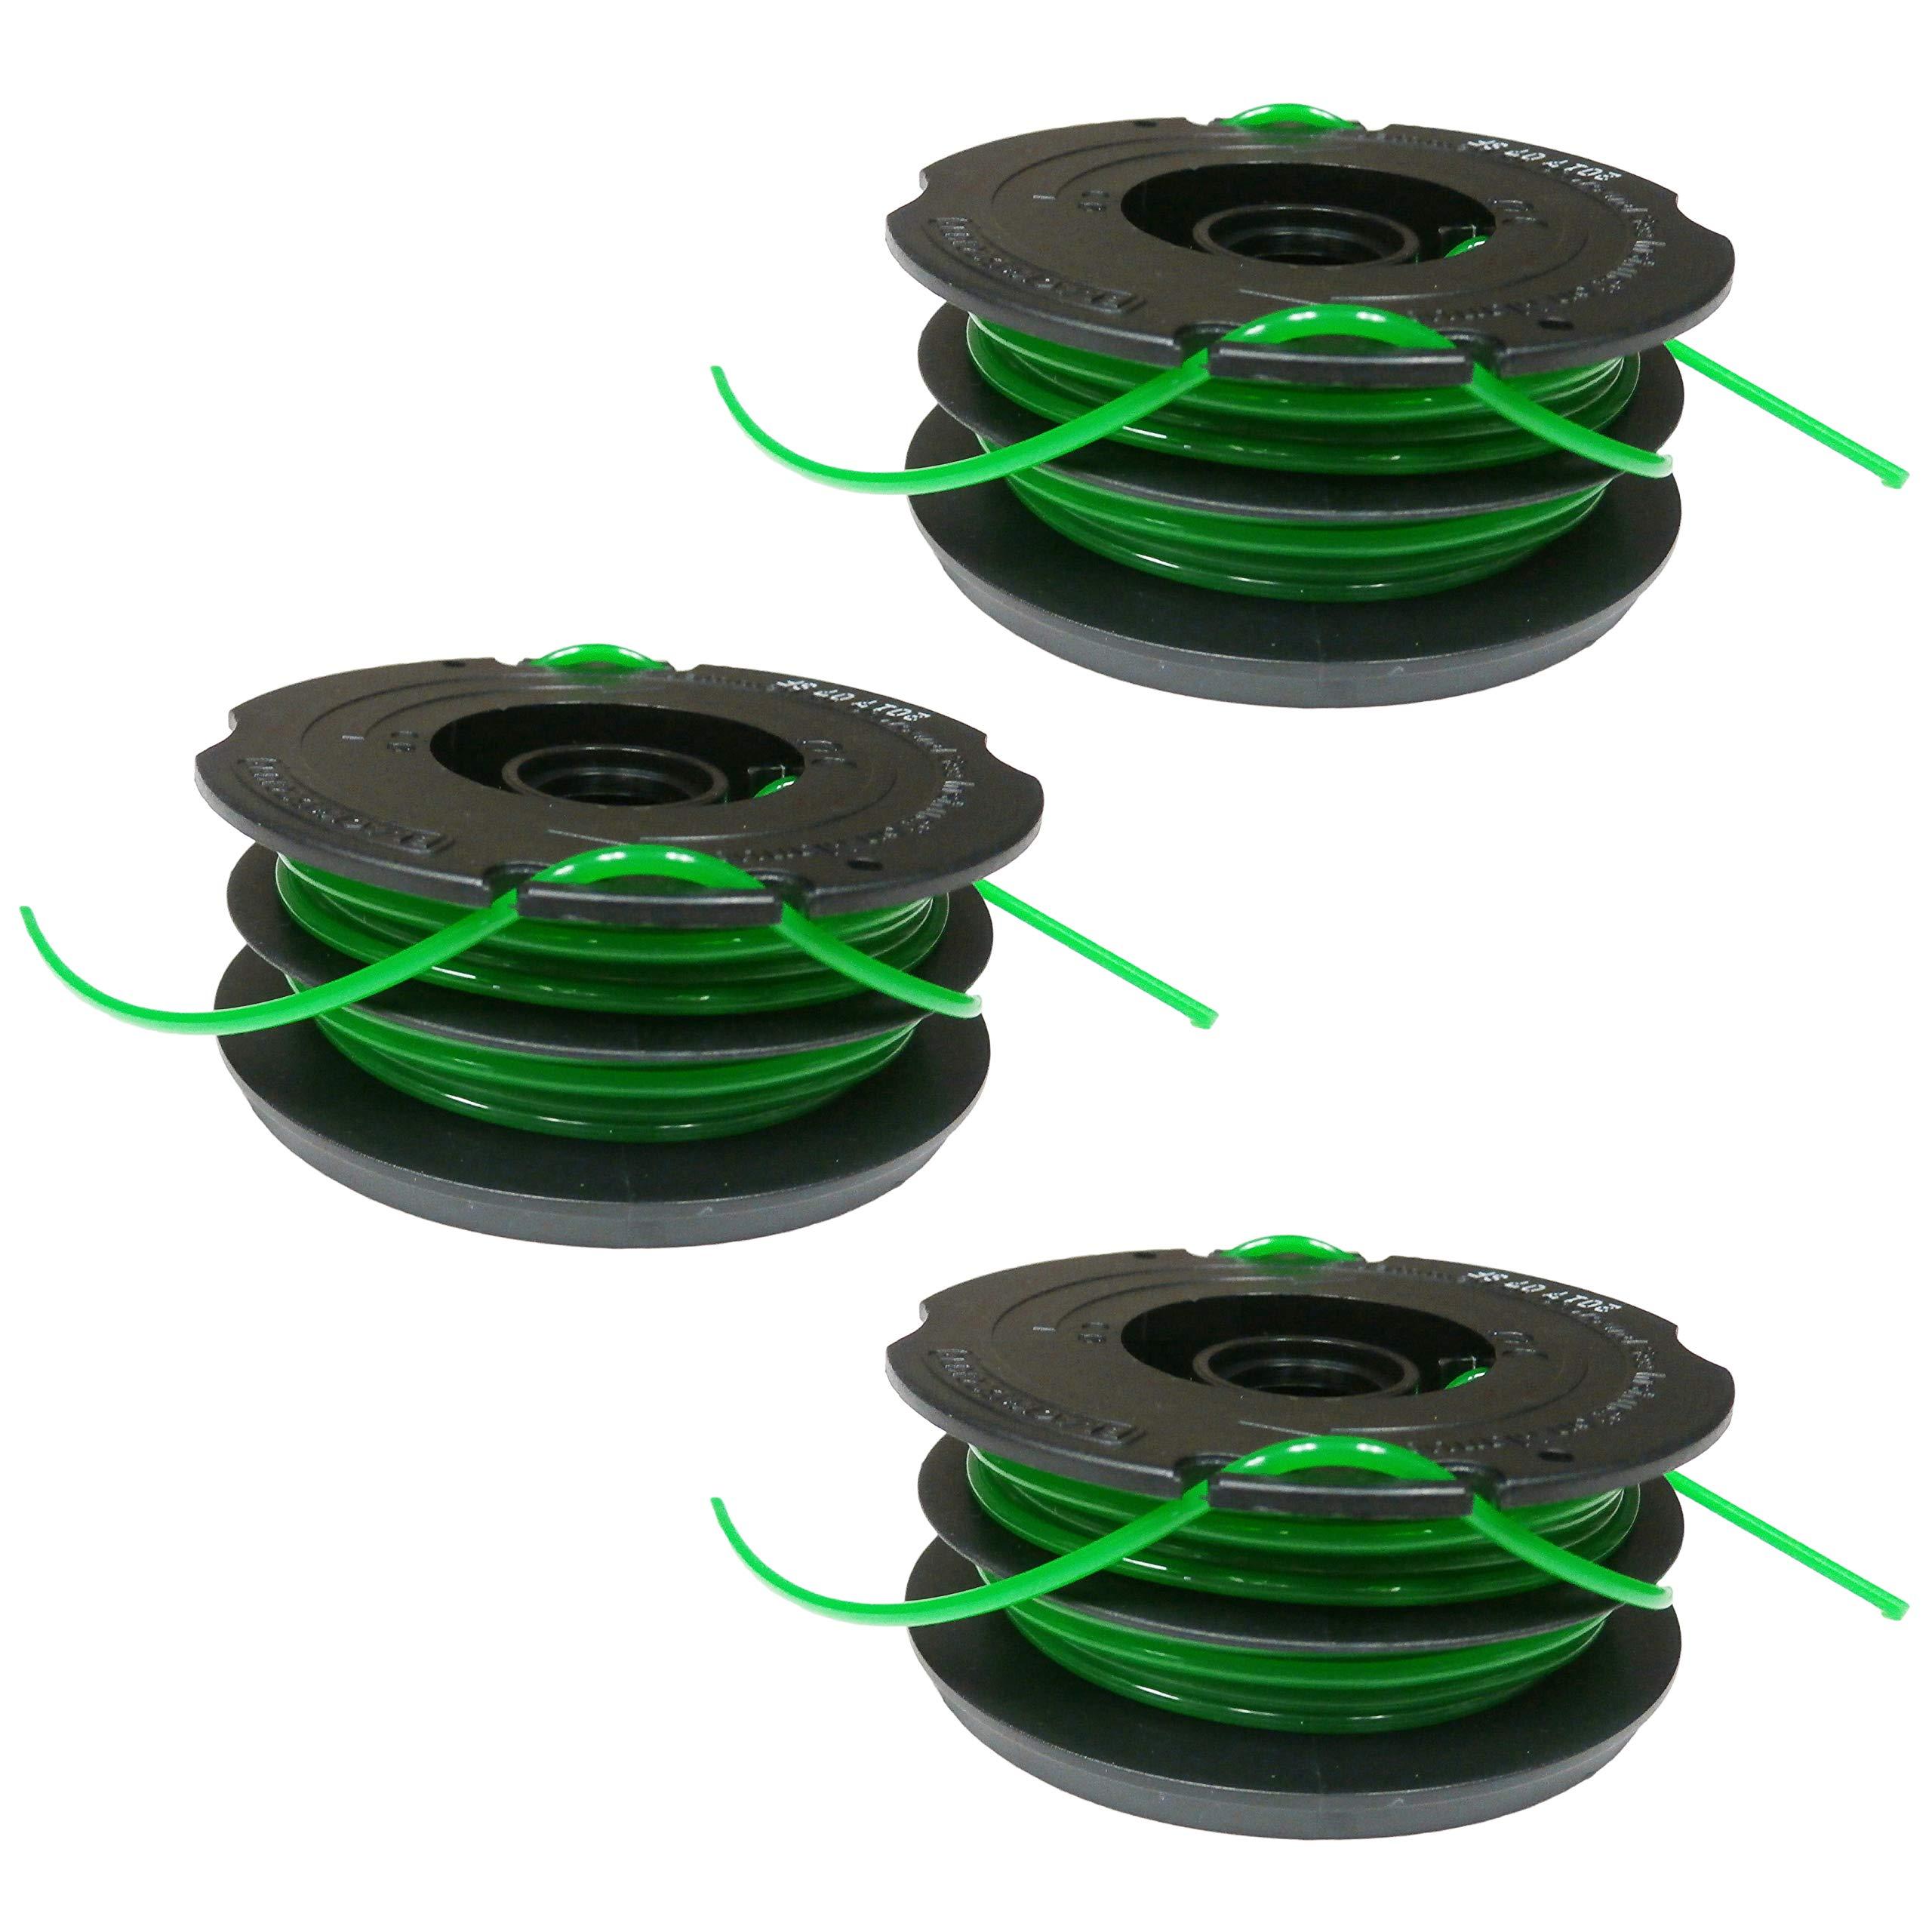 Black & Decker DF-080 Dual-Line Replacement Spools (3 Pack)